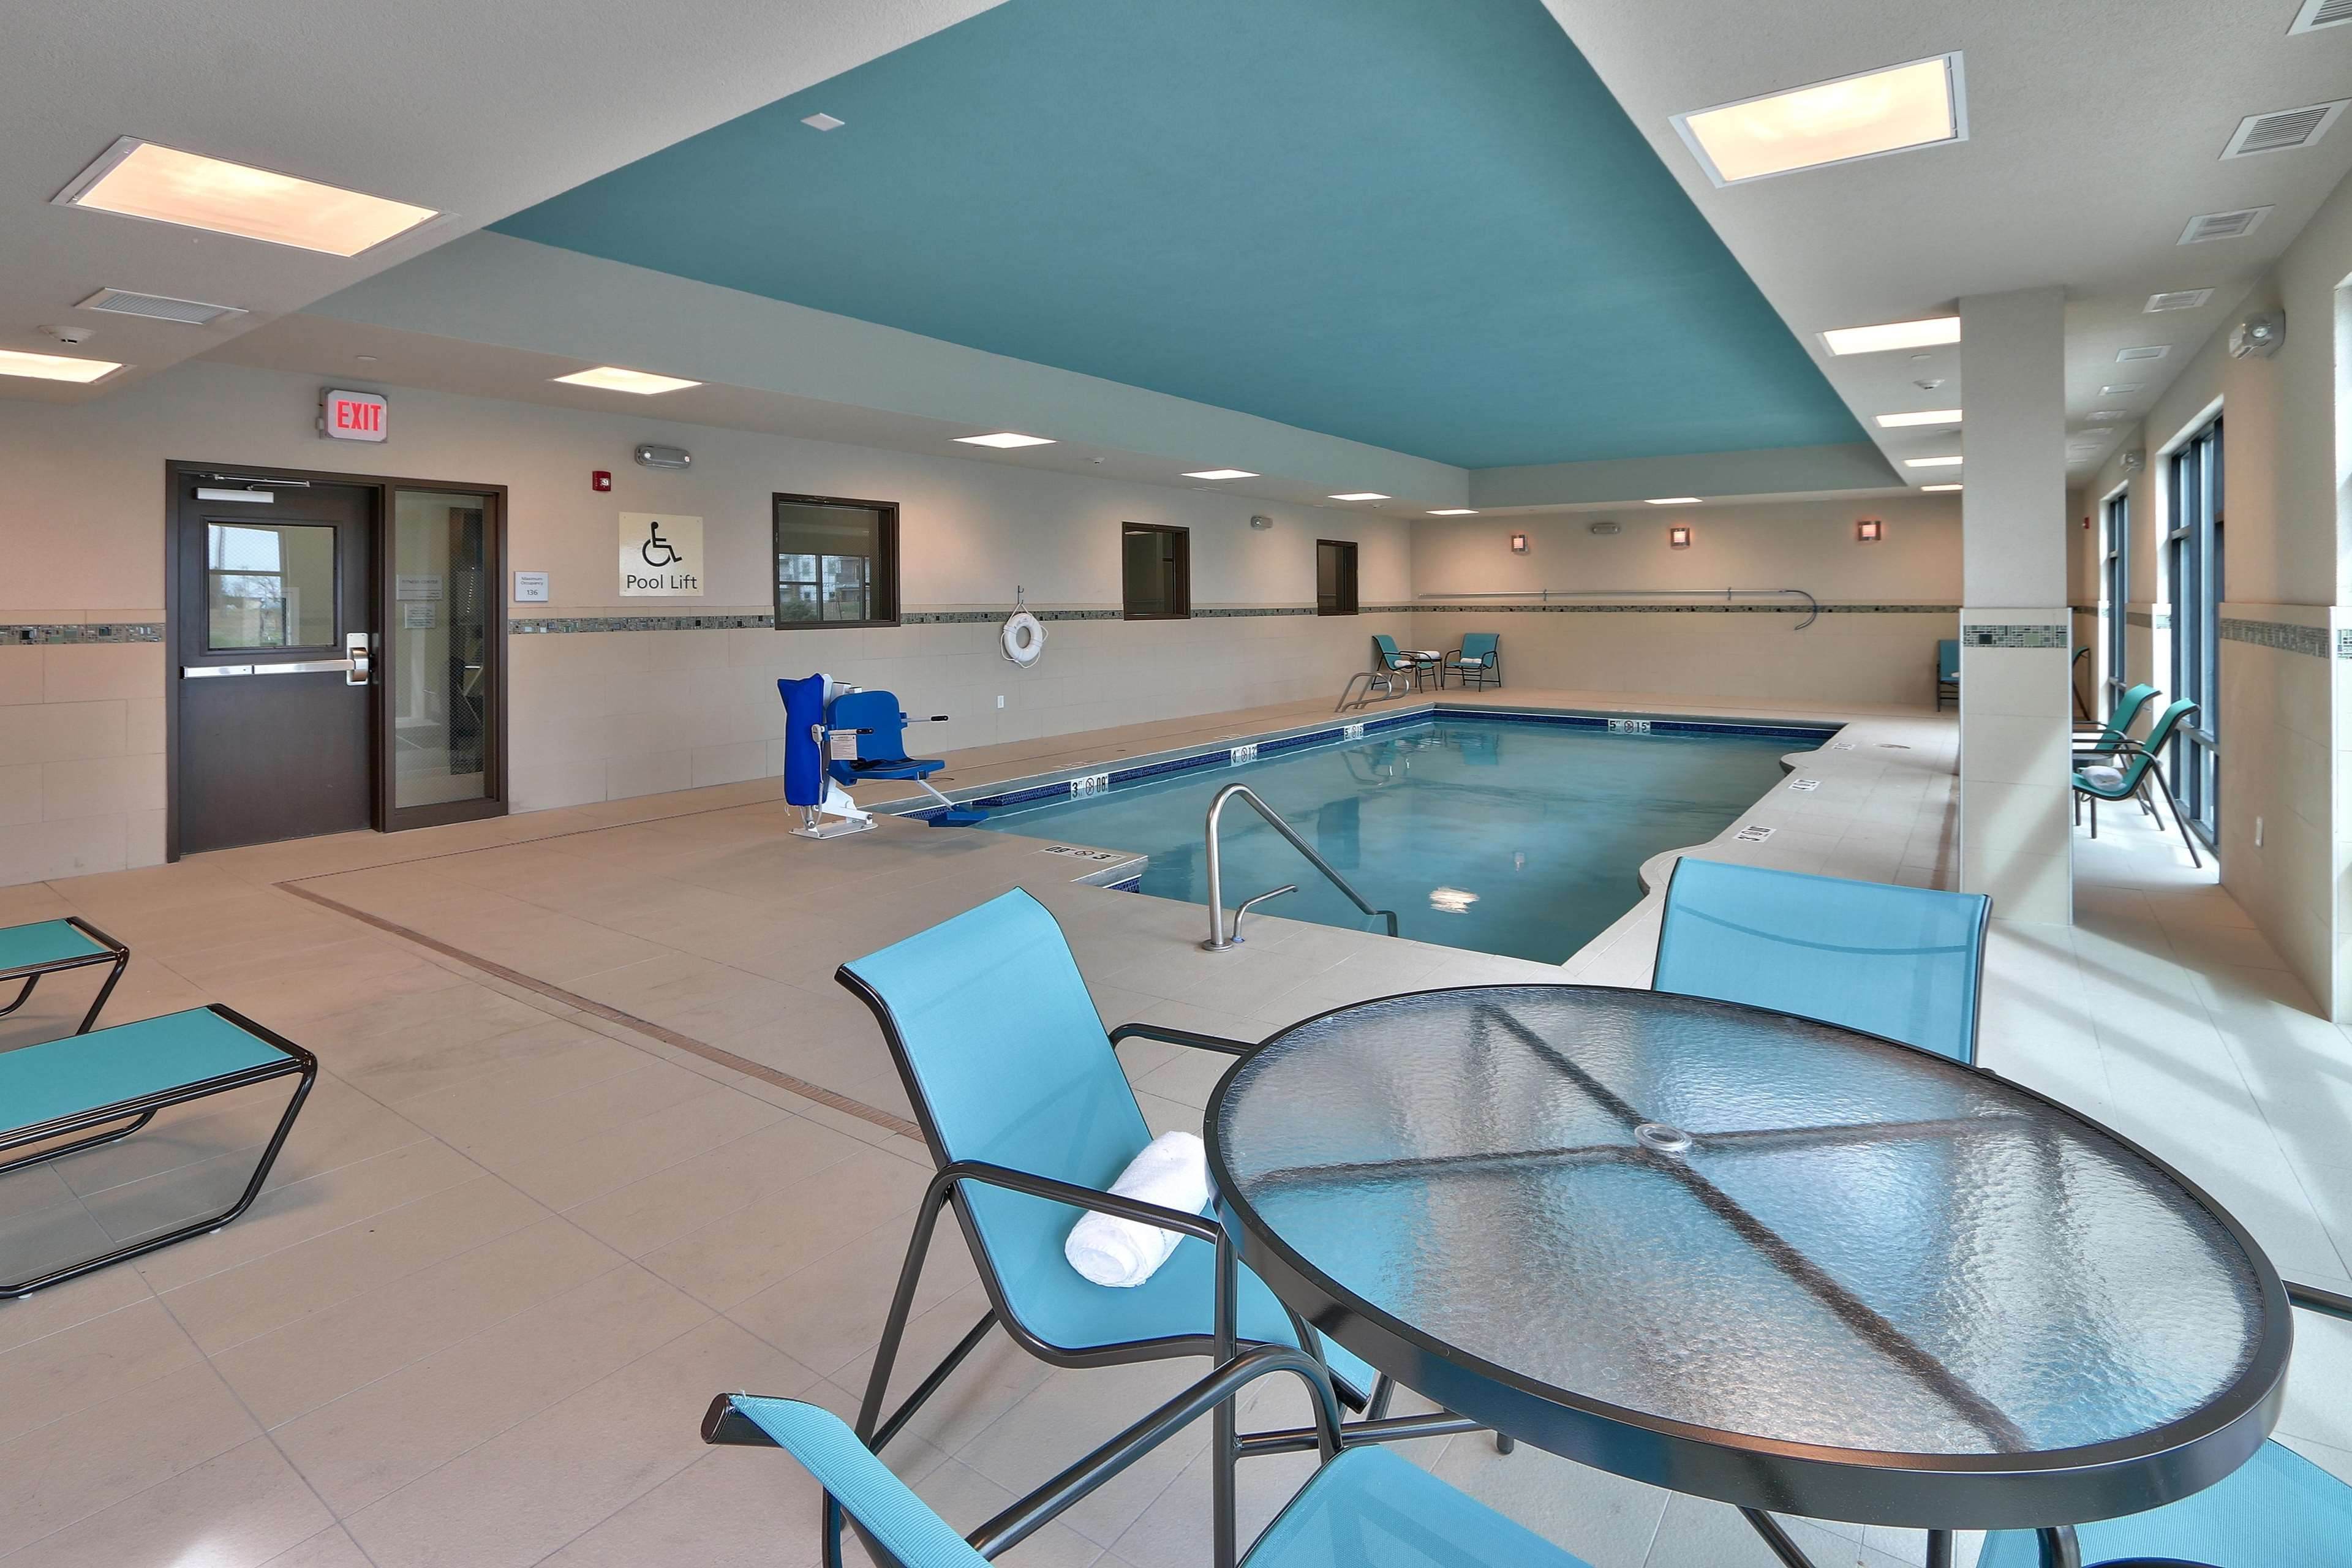 Hampton Inn & Suites Artesia image 24